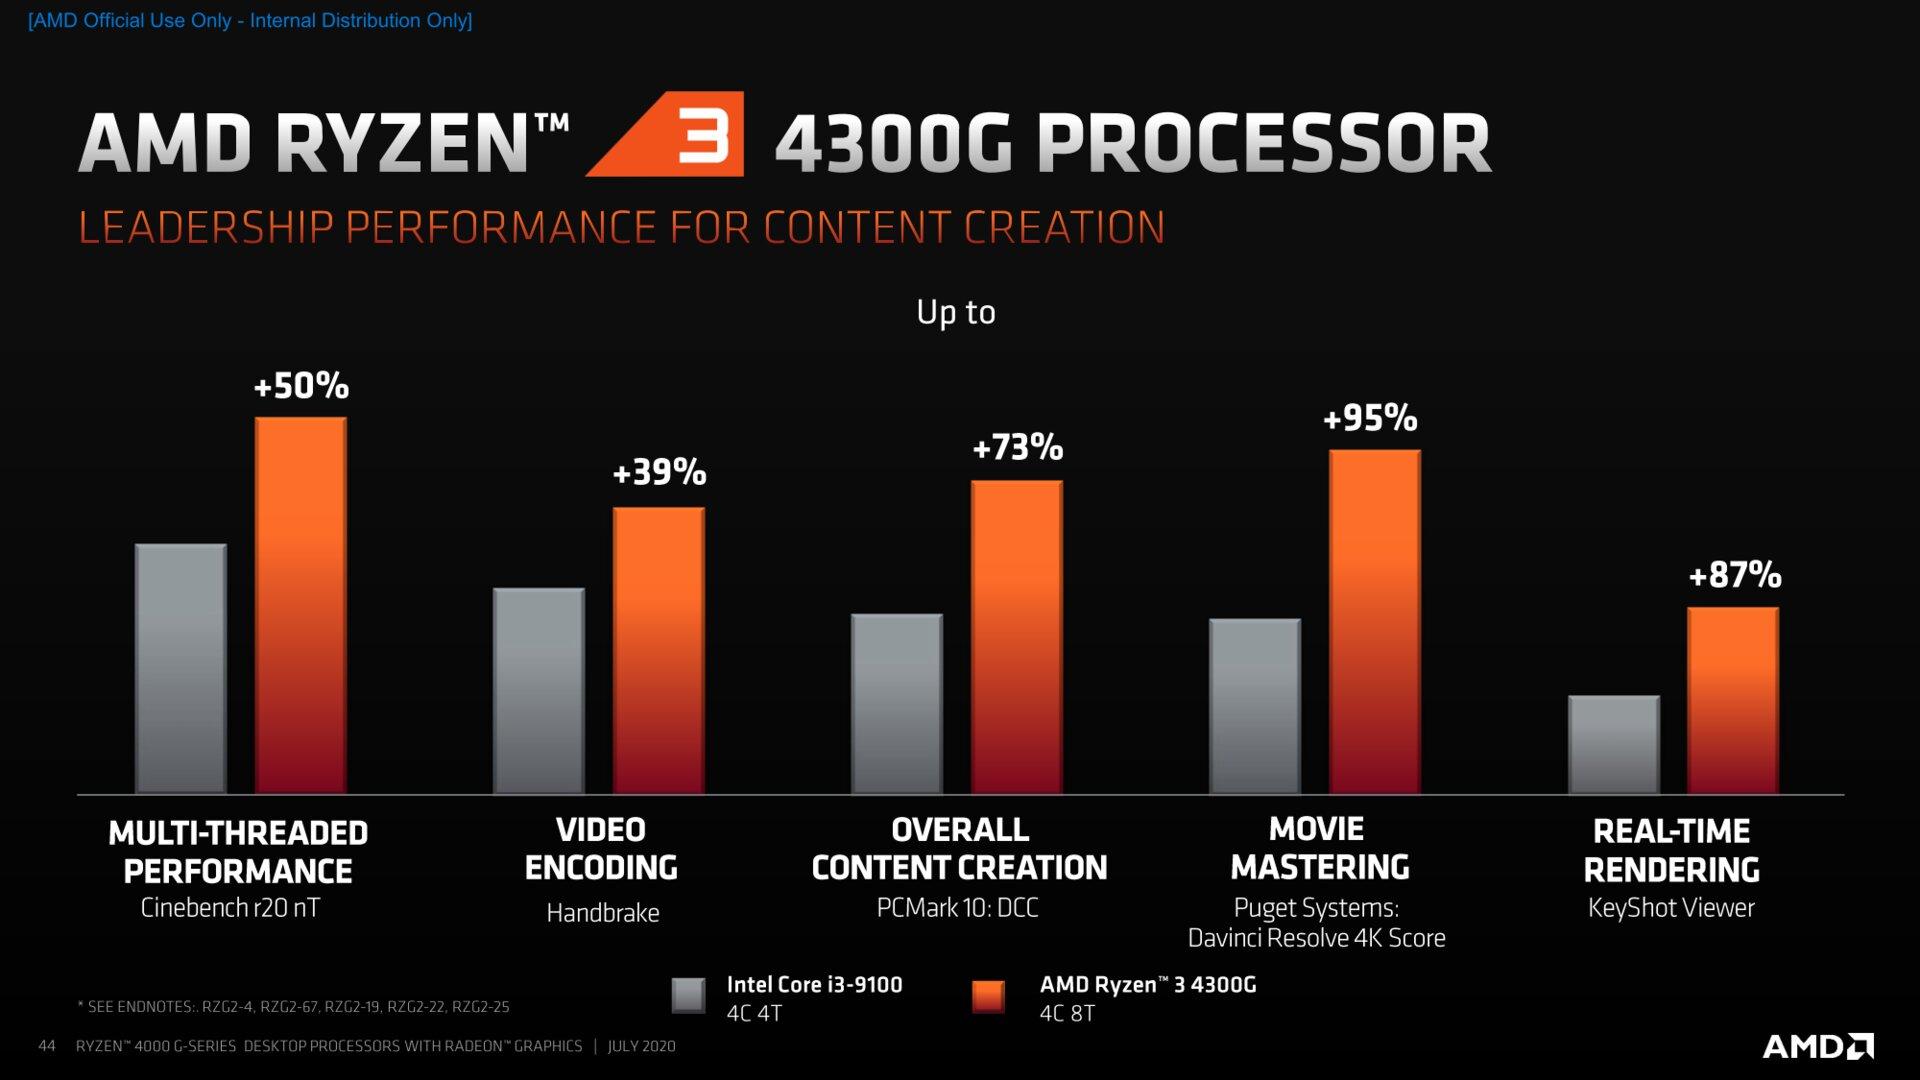 Ryzen 3 4300G Benchmarks